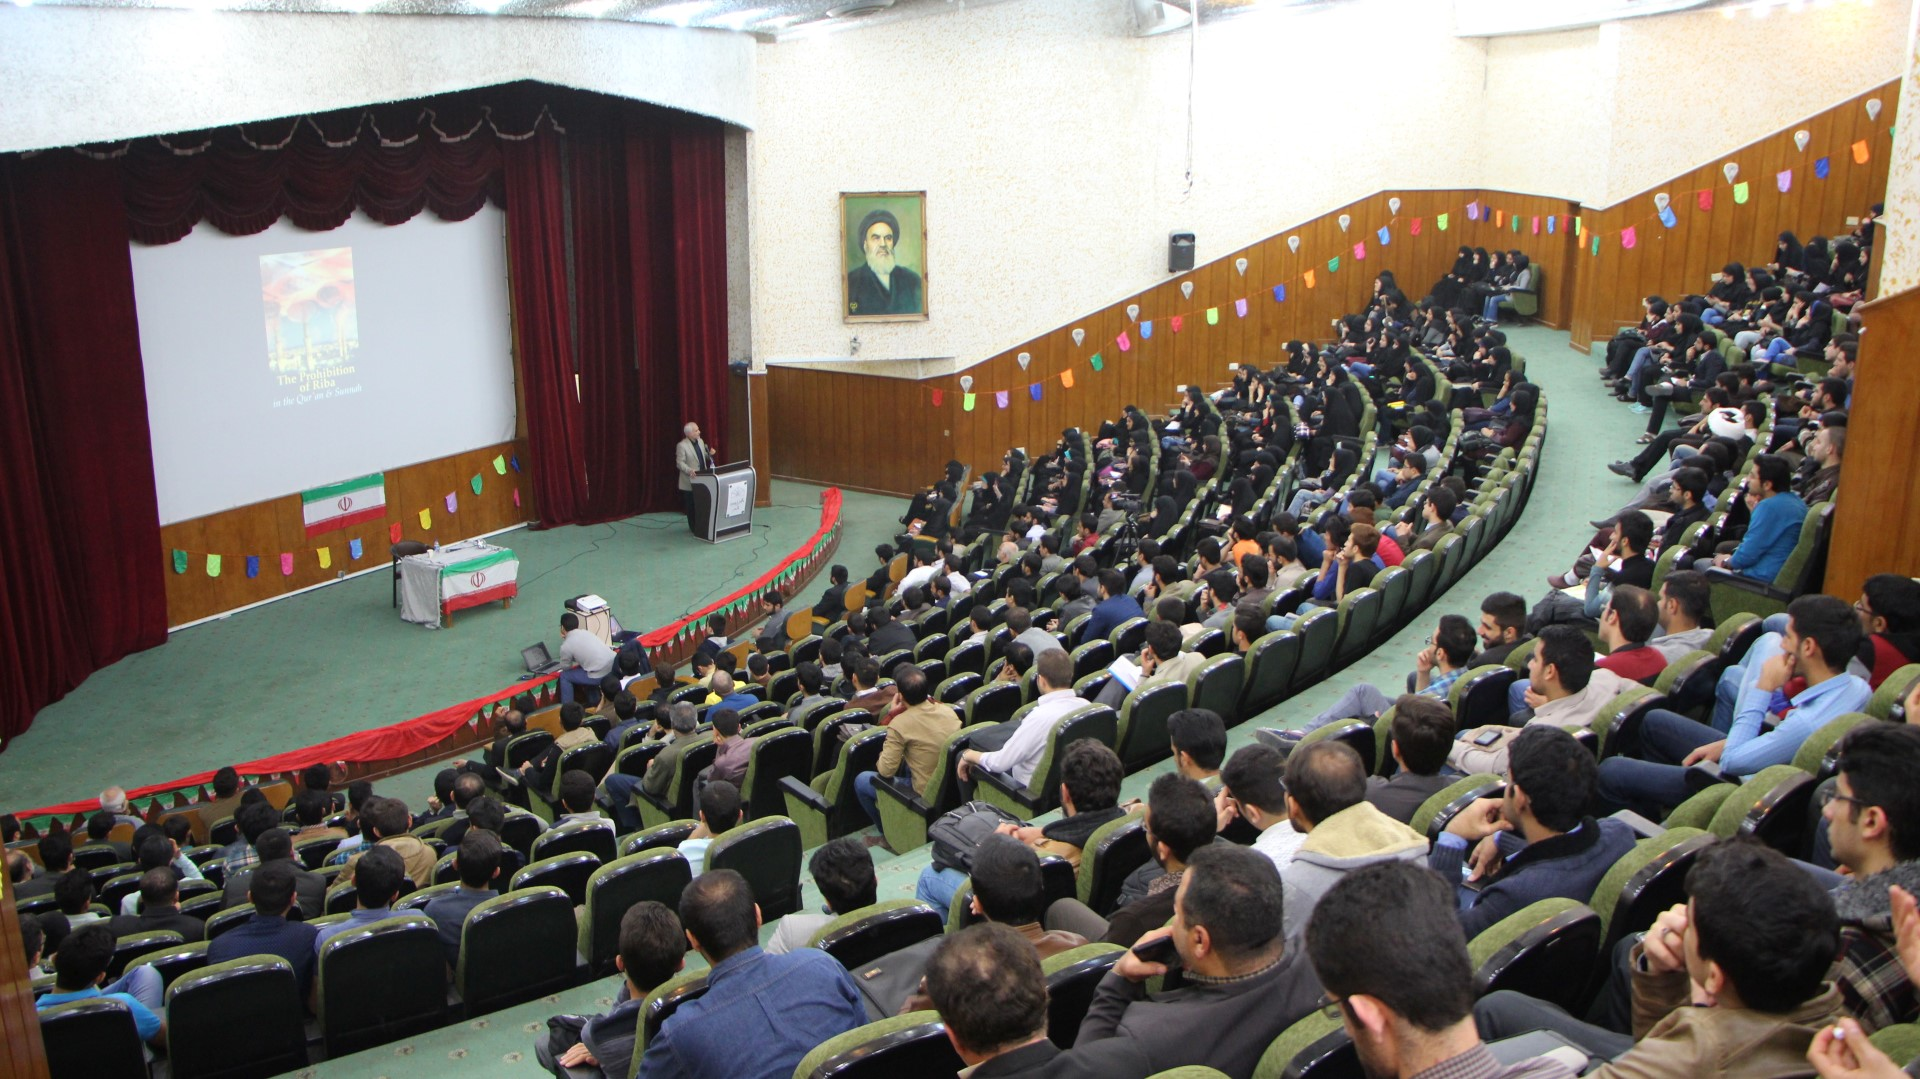 IMG 5278 گزارش تصویری؛ سخنرانی استاد حسن عباسی با موضوع از چوئن لای تا سیاست درهای باز